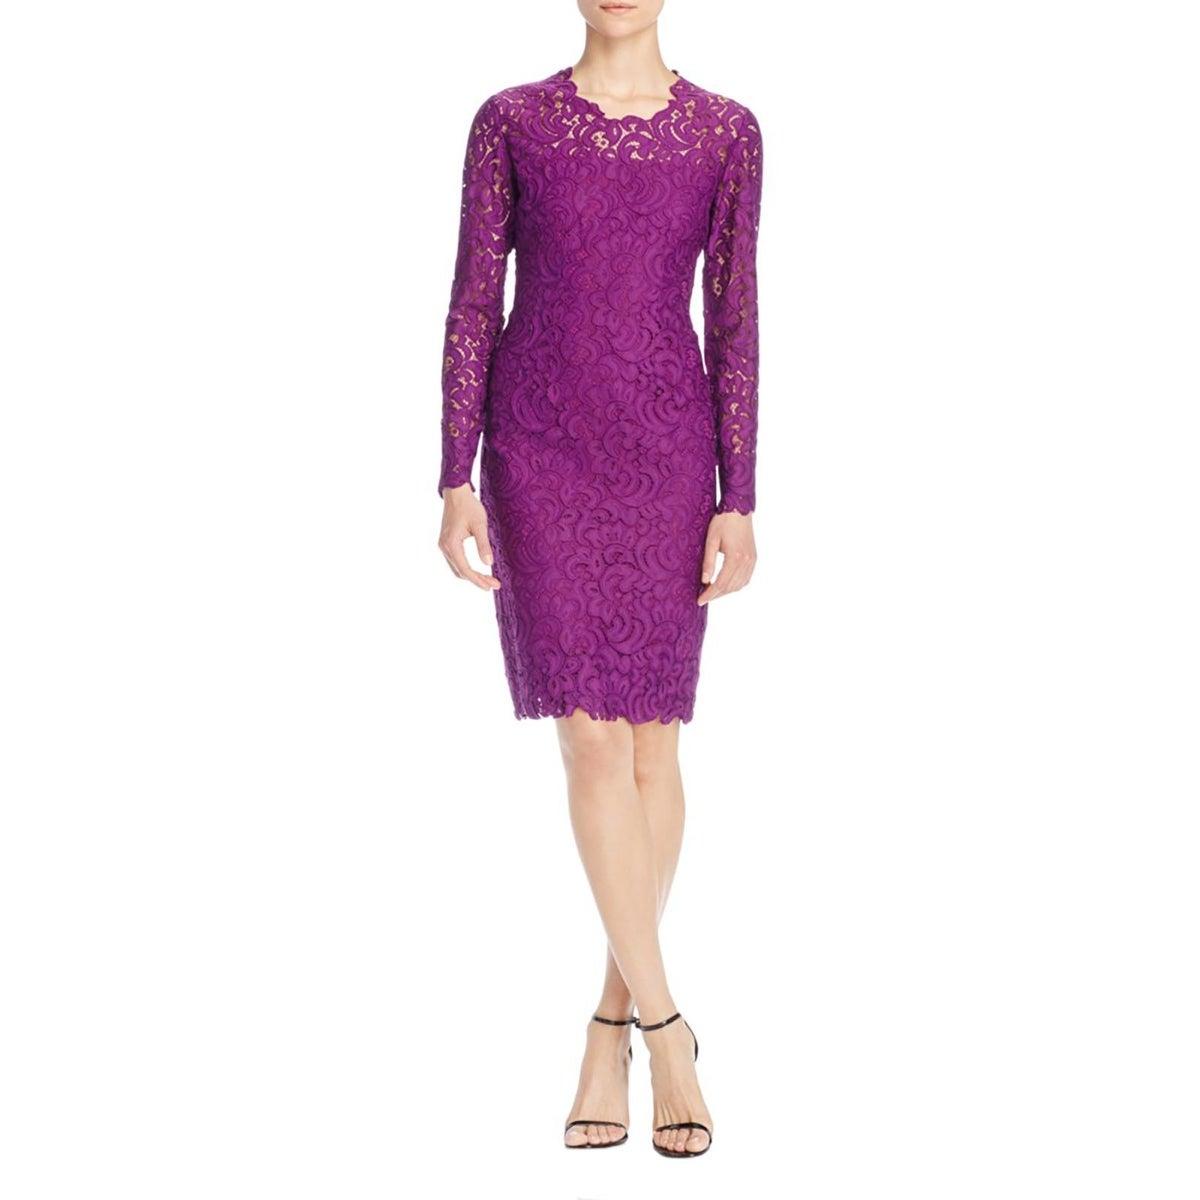 Elie Tahari Womens Bellamy Cocktail Dress Lace Long Sleeves - Free ...